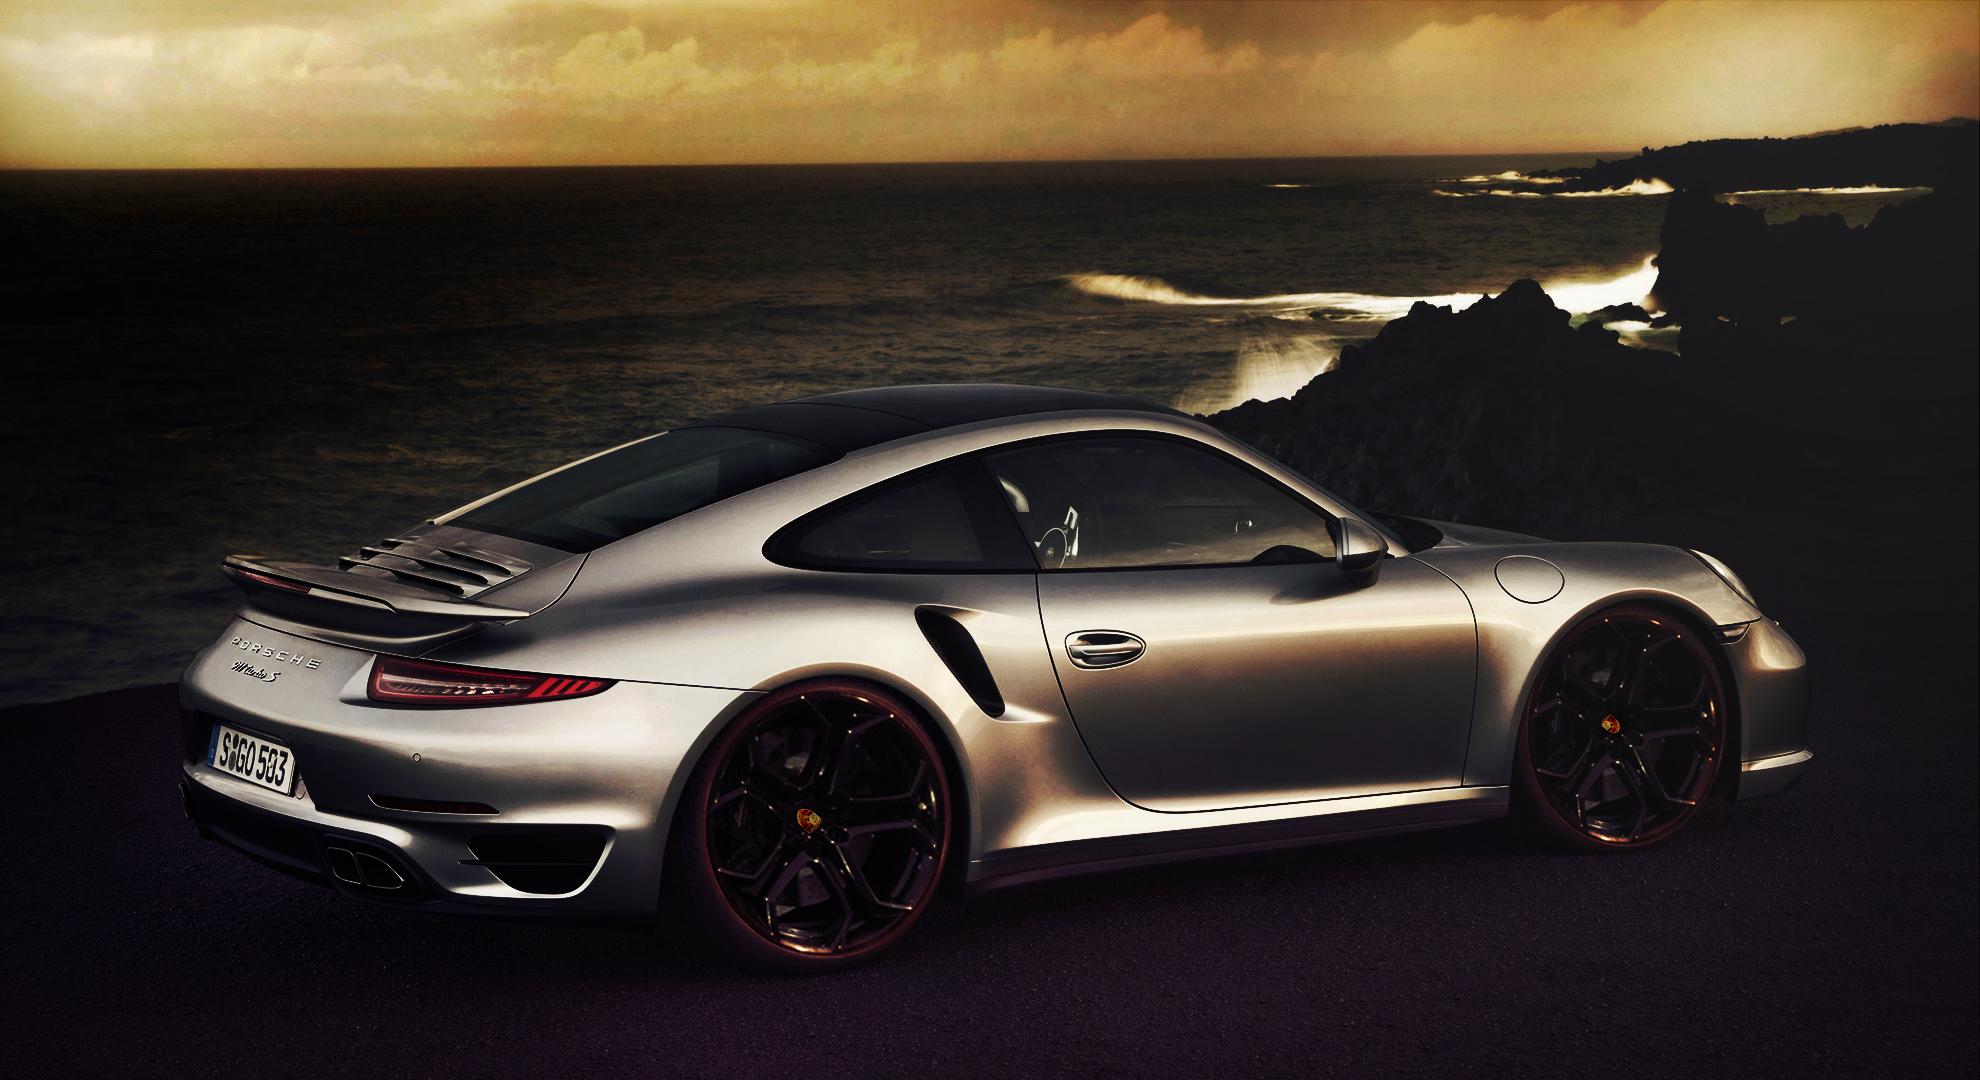 porsche 911 turbo s wallpaper by gfxy on deviantart - 2015 Porsche 911 Turbo Wallpaper